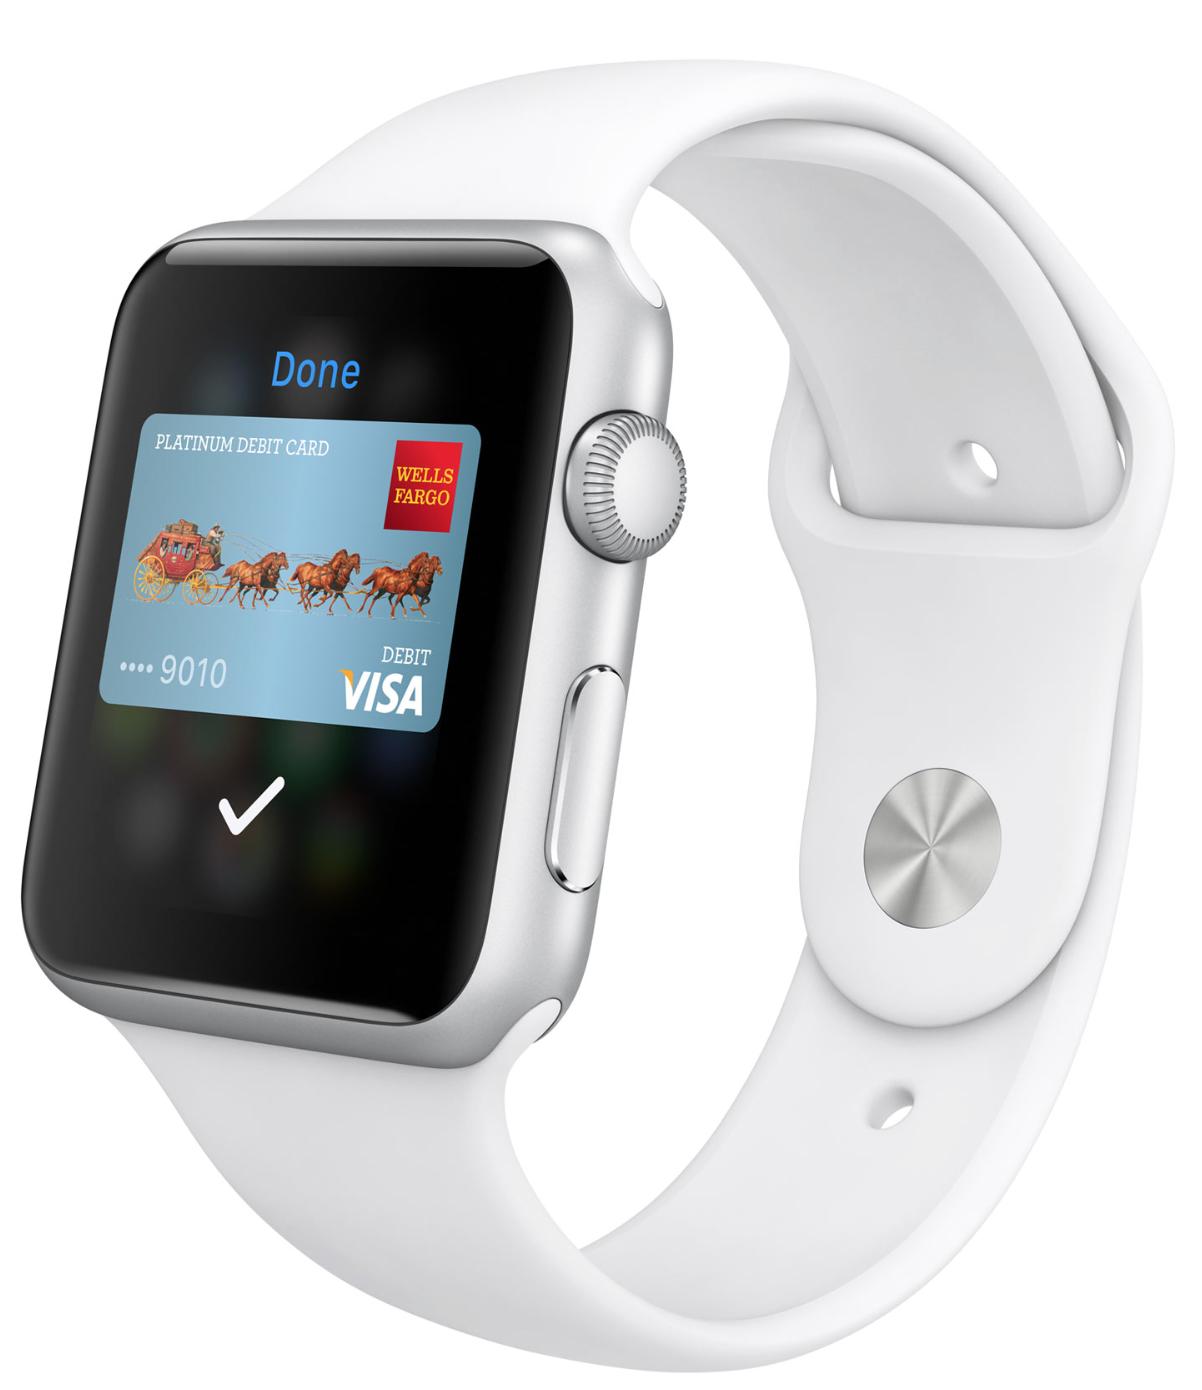 Jawbone анонсировал убийцу Apple Watch и привлек $300 млн инвестиций - 1